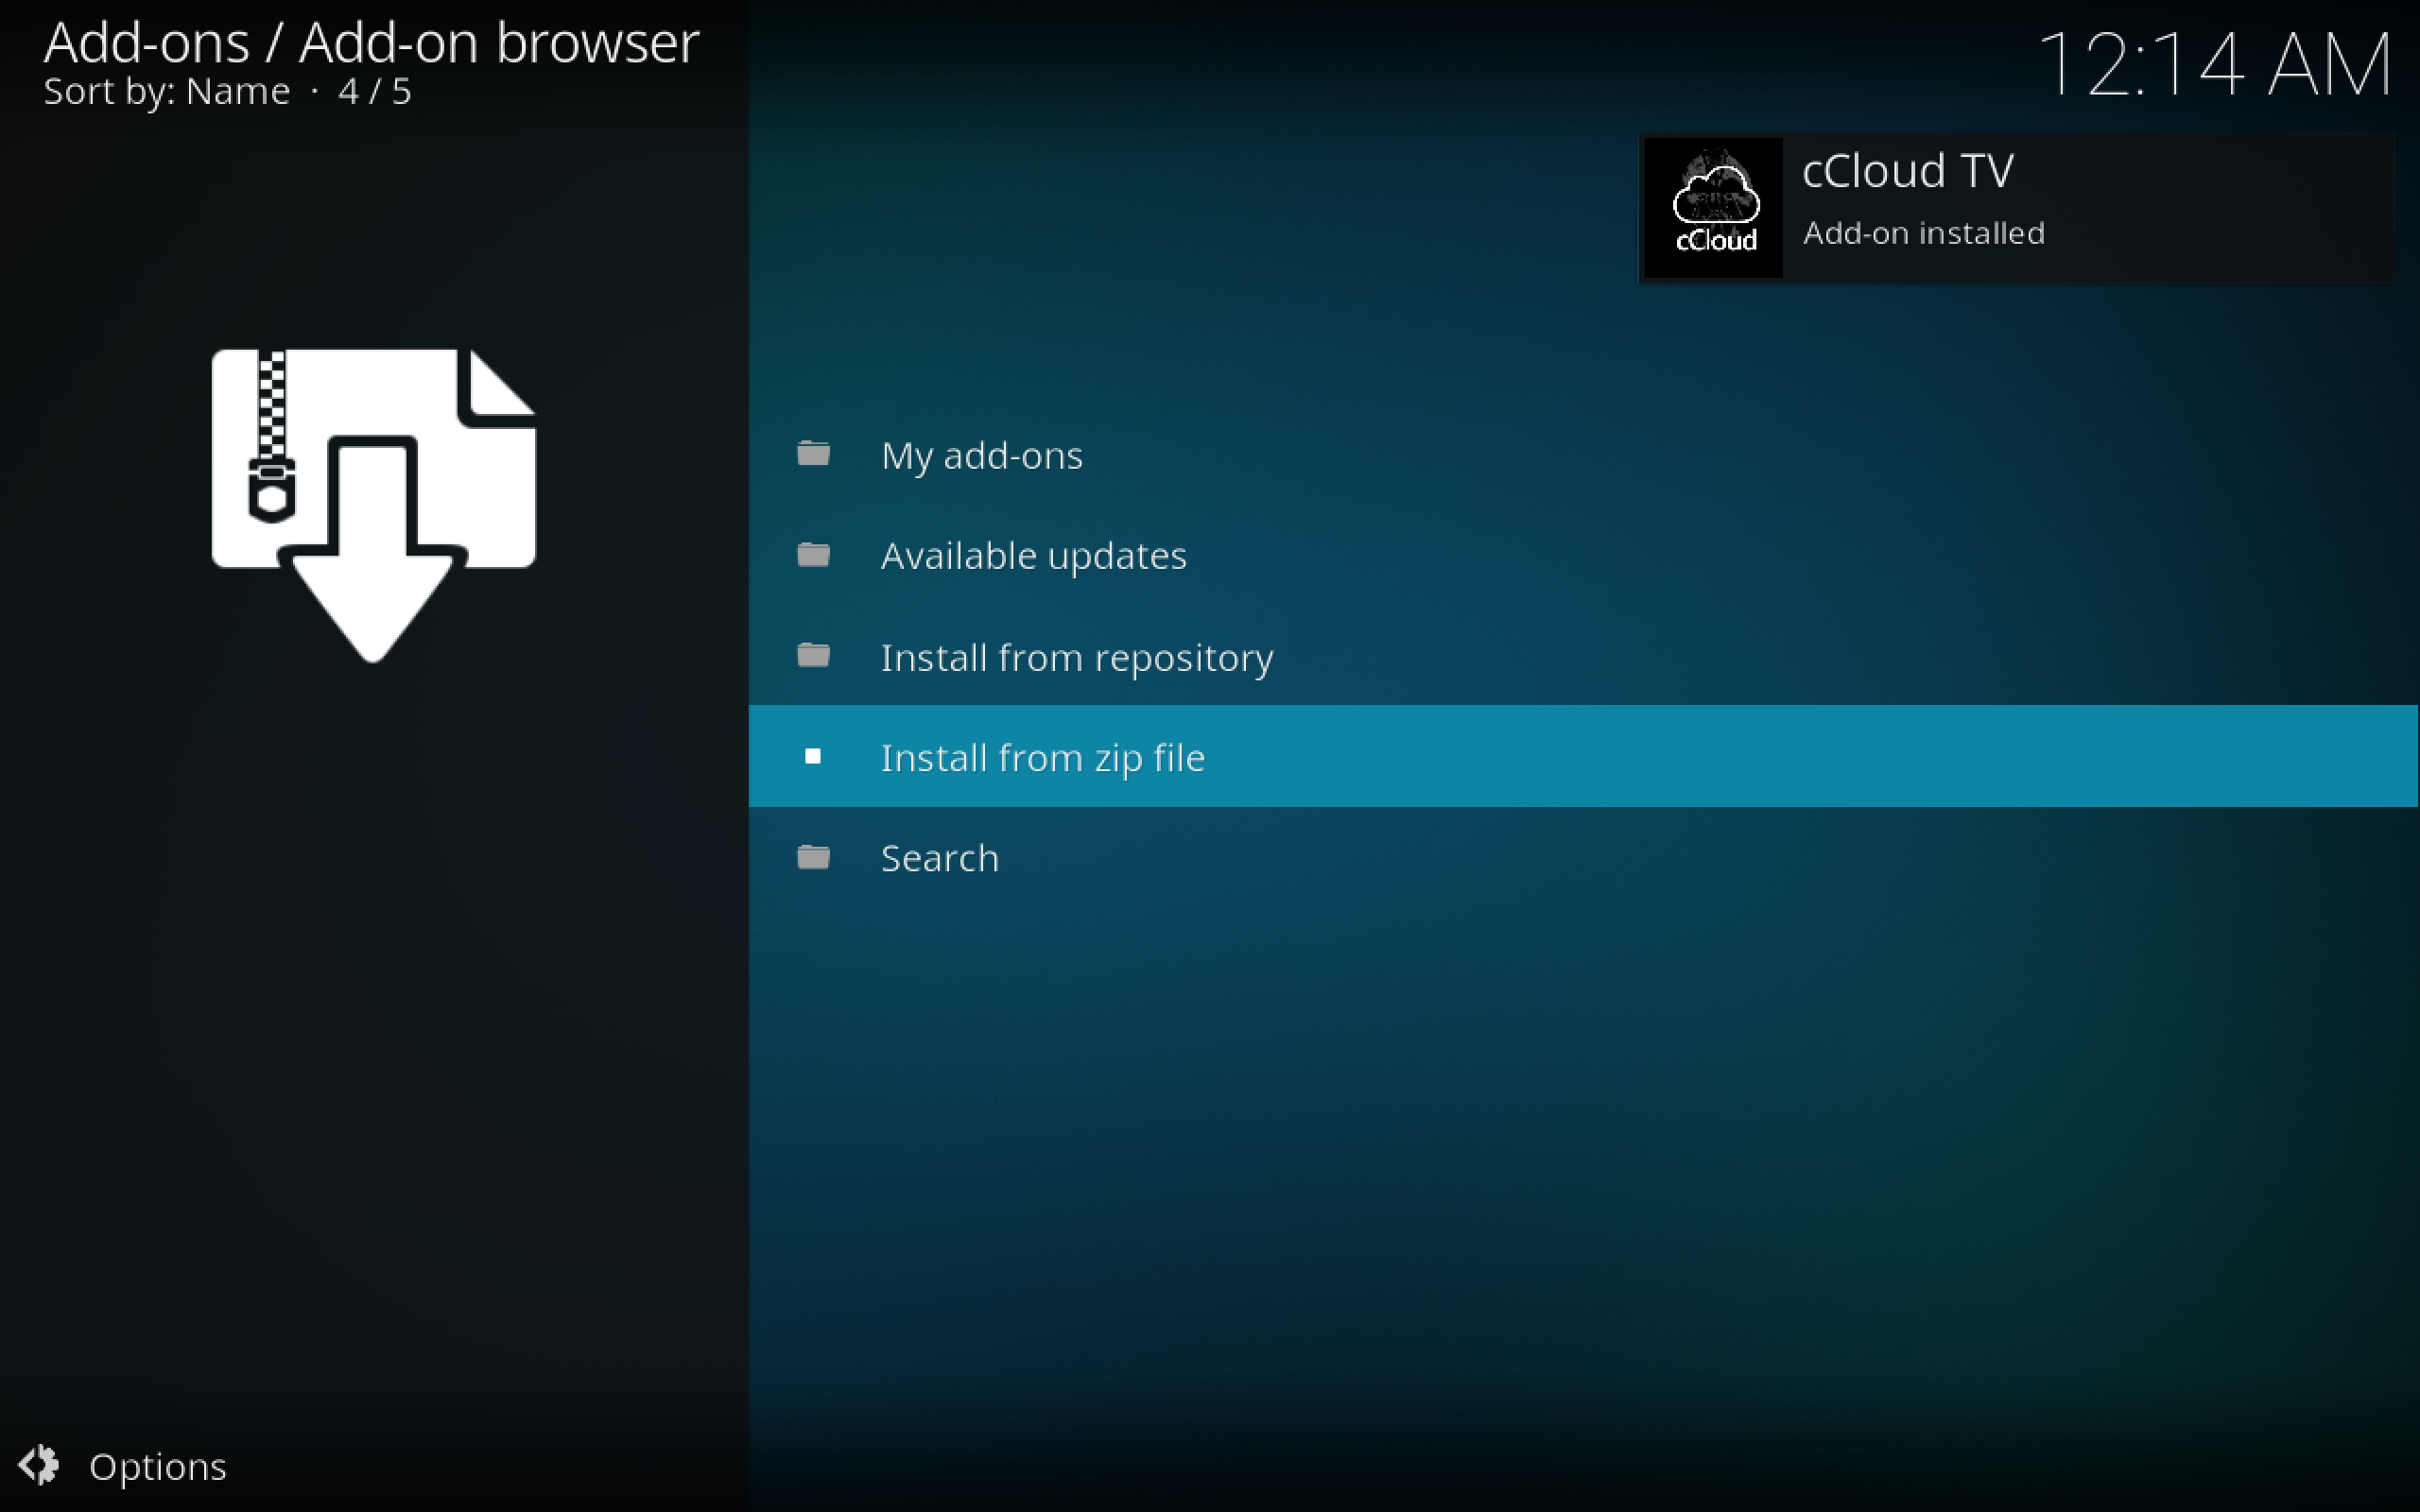 cCloud TV Kodi Add-on Installed